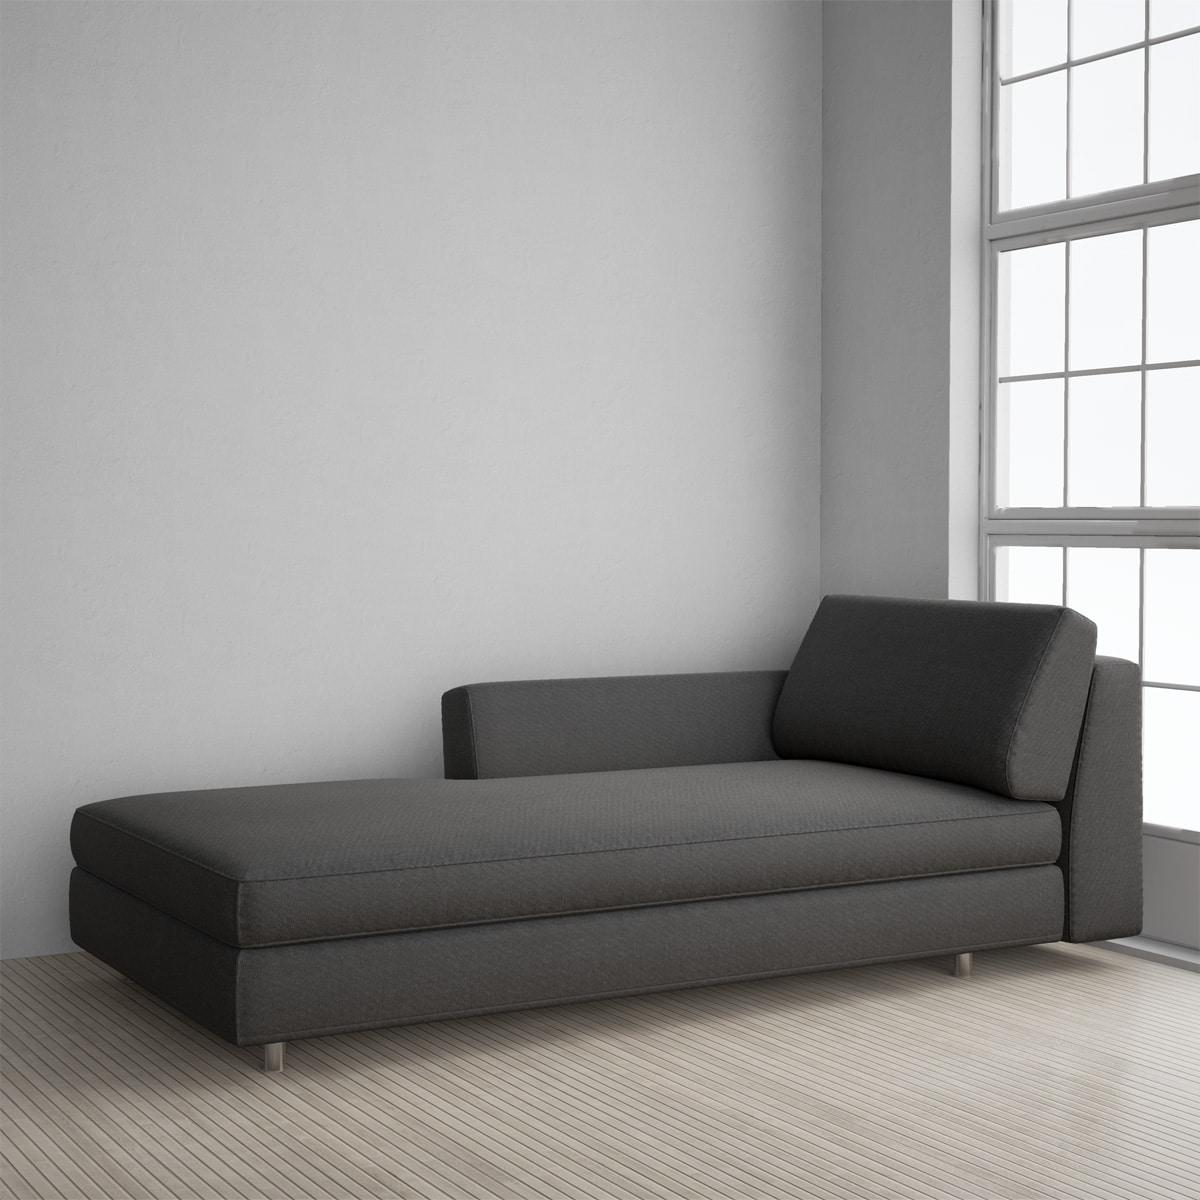 cassina mister sofa module 03 ue4arch. Black Bedroom Furniture Sets. Home Design Ideas